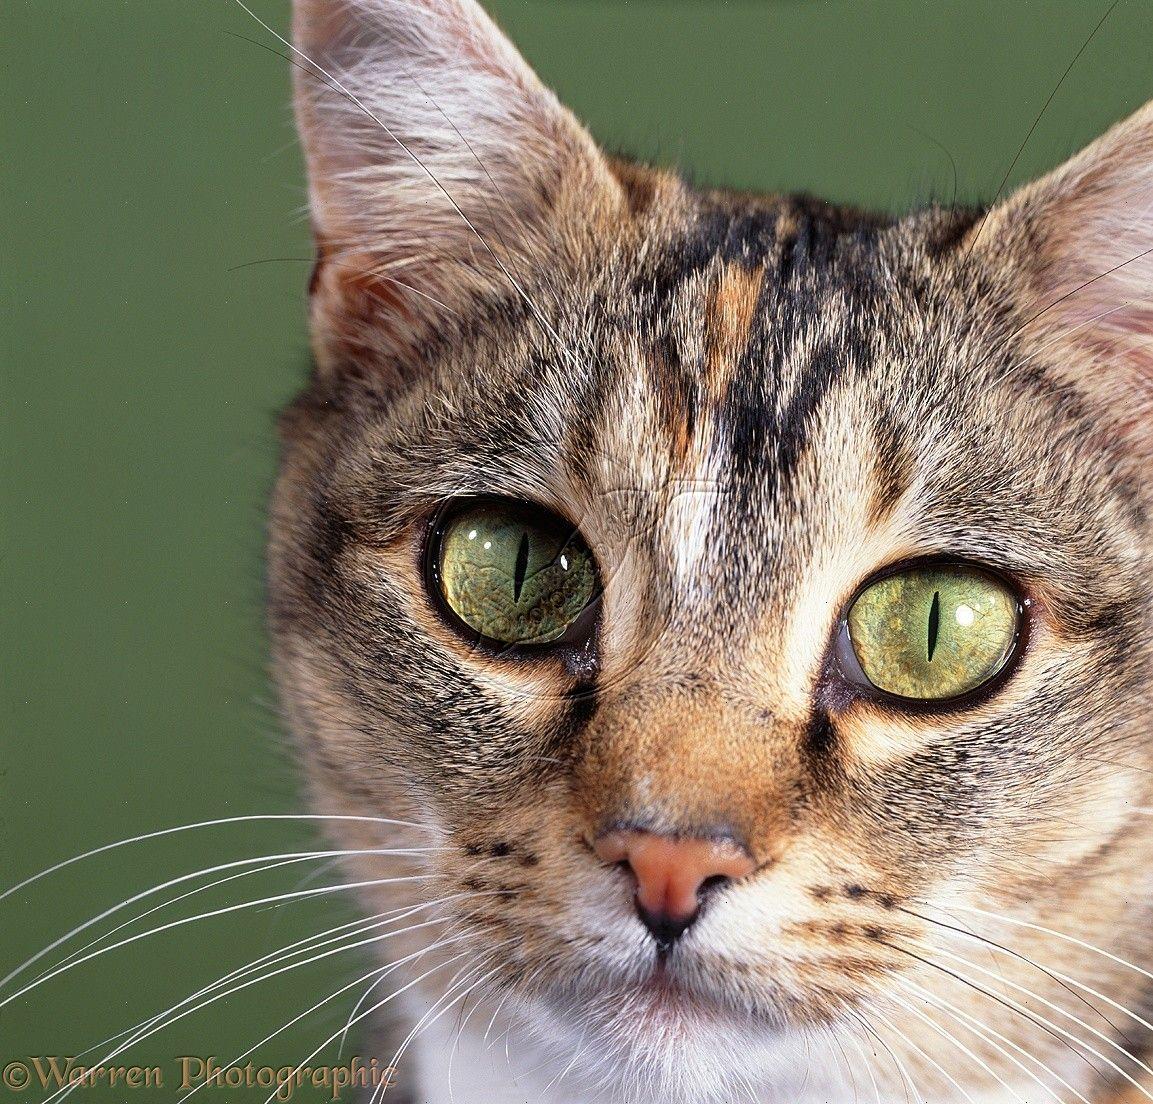 Cat WP05398 Tabby tortoiseshell cat with pupils closed